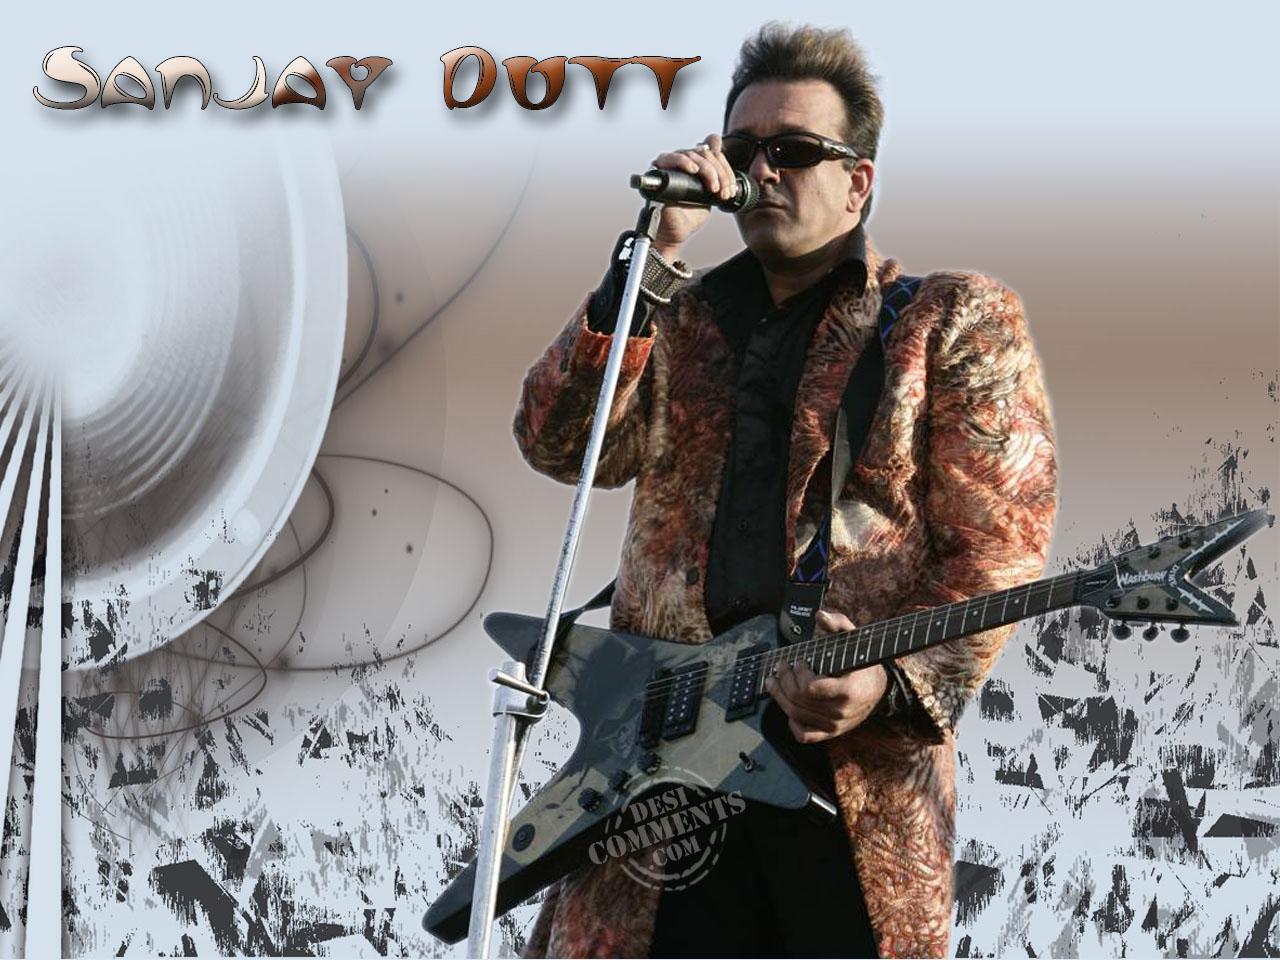 http://1.bp.blogspot.com/-EbDRzaEwE4c/Ti0T903NIjI/AAAAAAAACIo/Cldfkhj8Z4c/s1600/Pics-of-Sanjay-Dutt.jpg